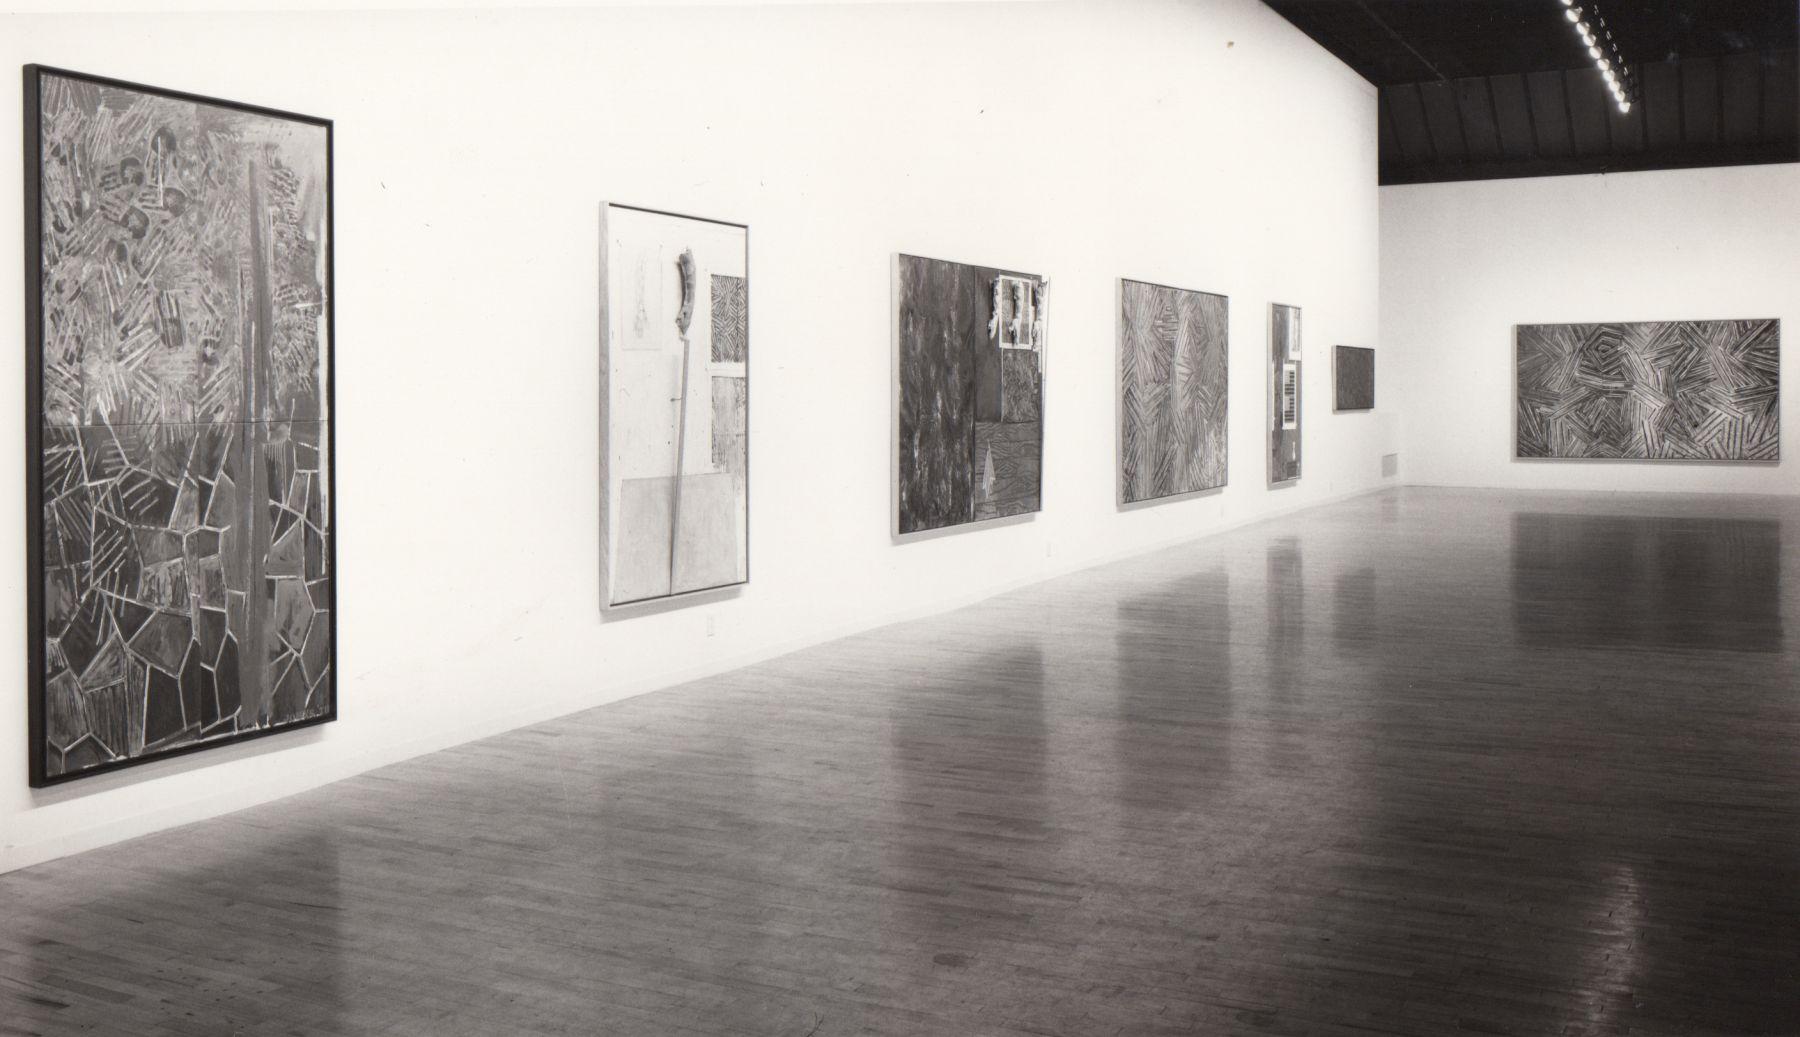 Installation view, Jasper Johns, 142 GREENE